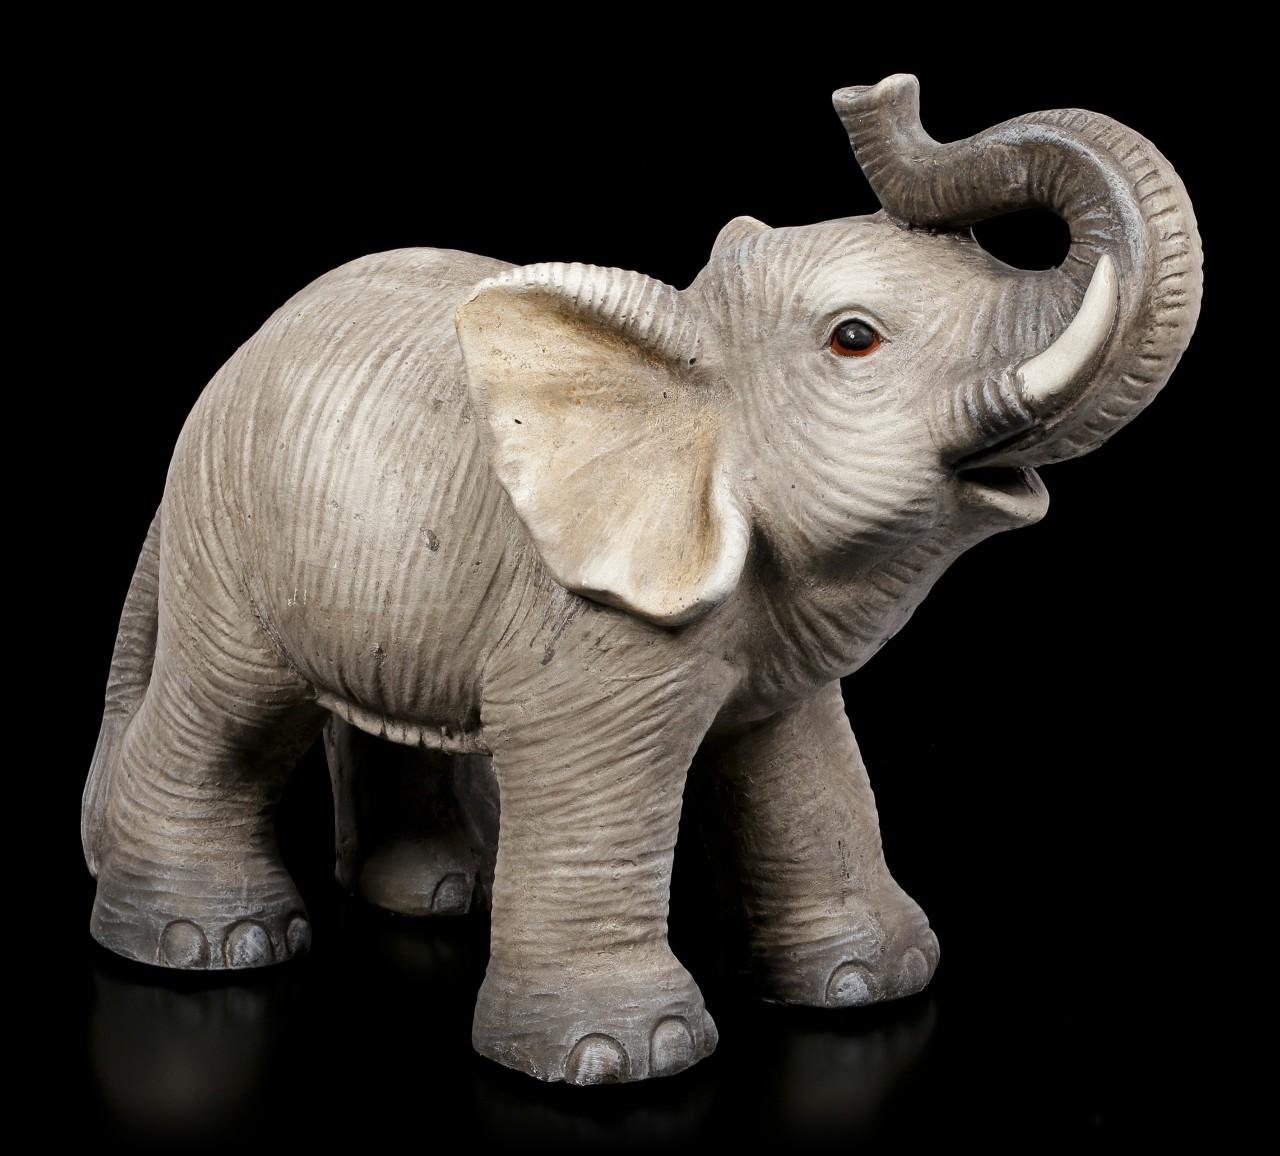 Garden Figurine - Elephant with raised Trunk